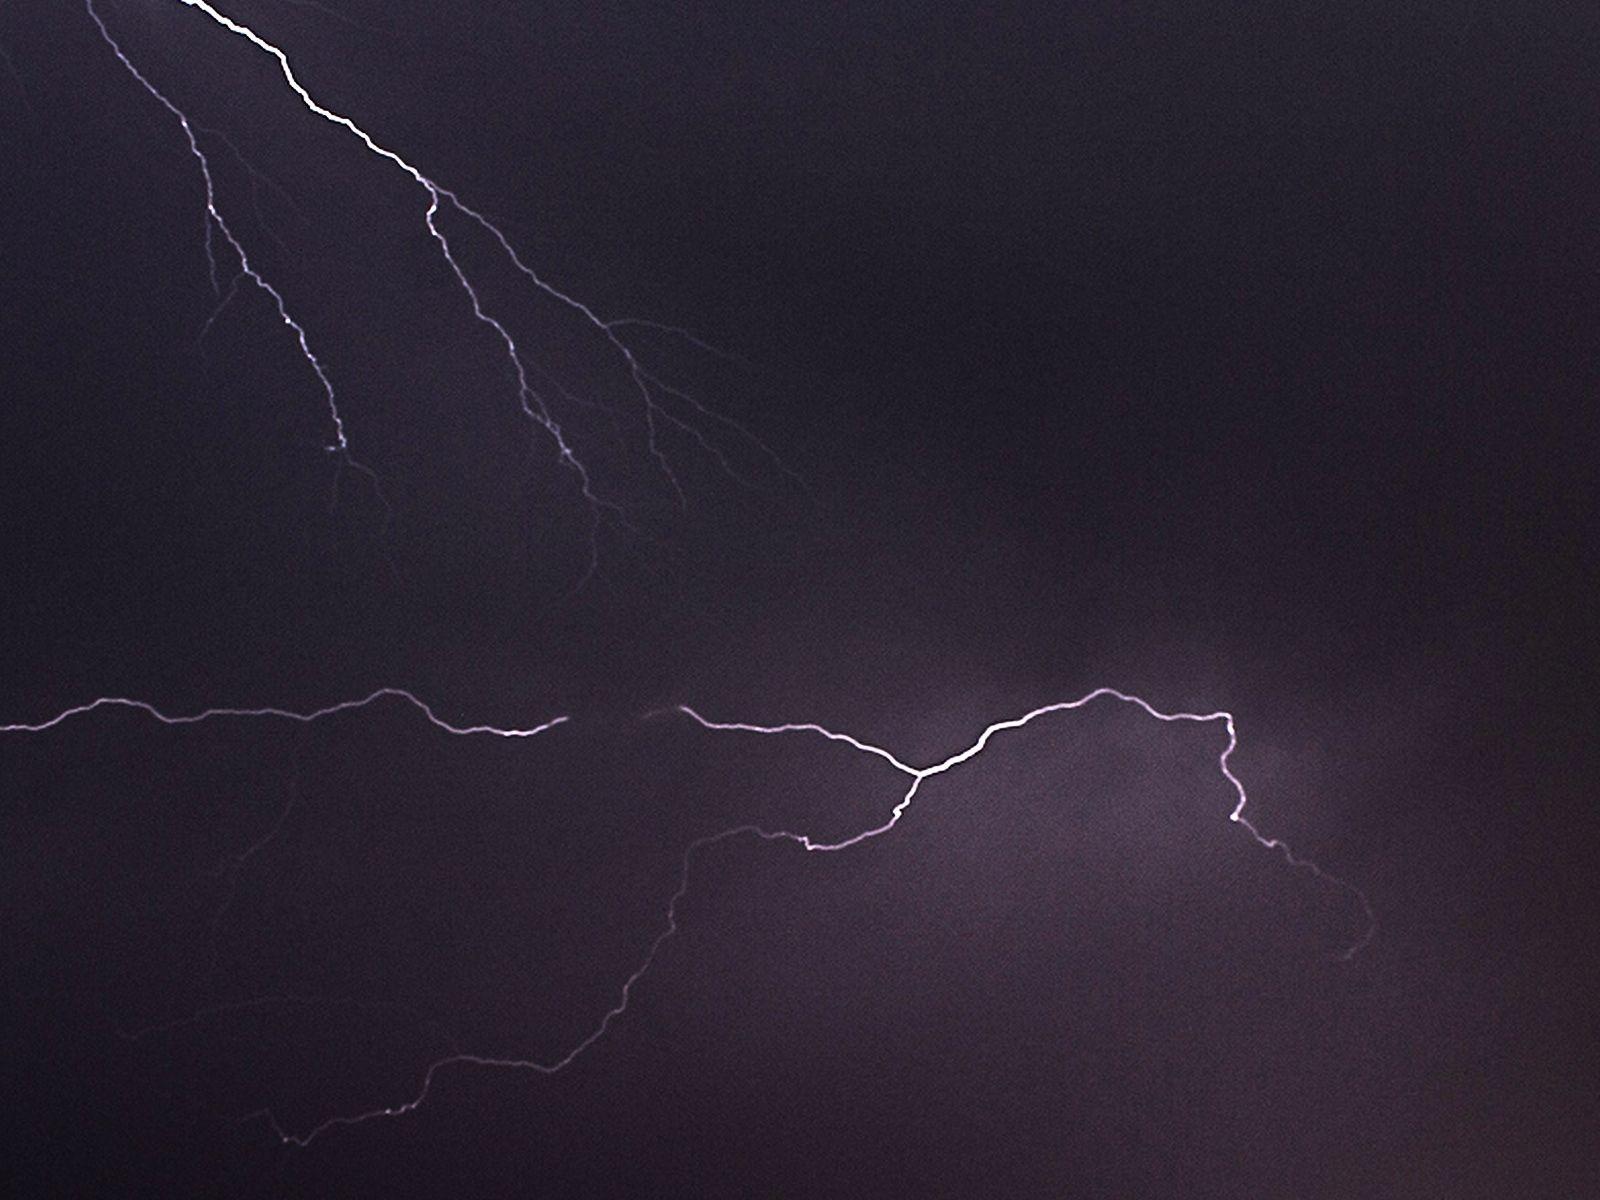 Theme Thunderstorm - Nightly Flashes...